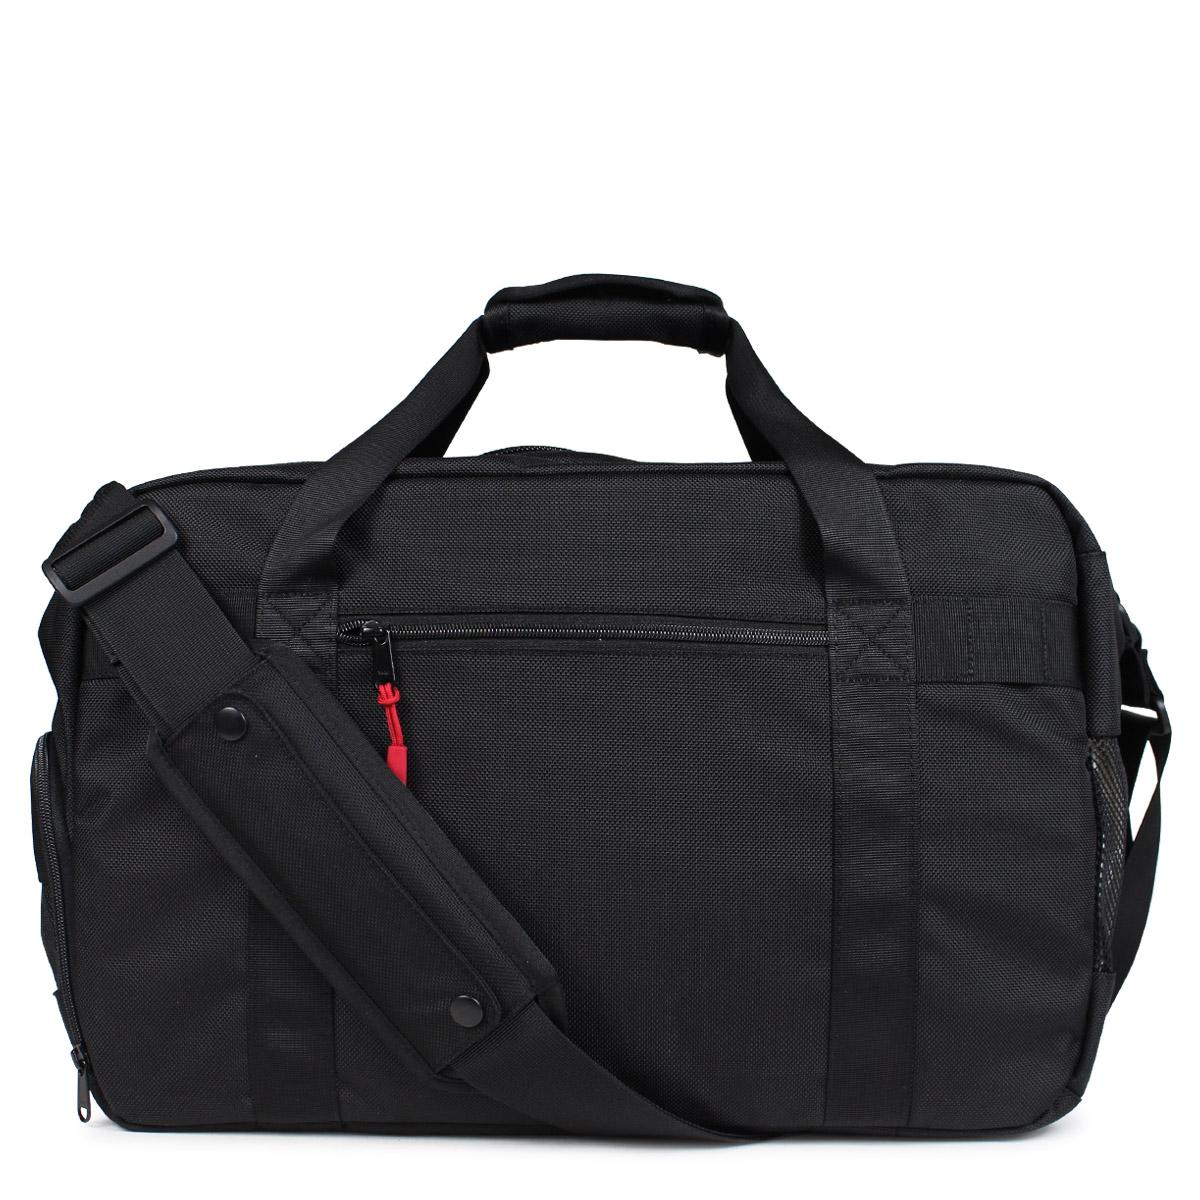 DSPTCH GYM WORK BAG ディスパッチ バッグ ジムバッグ メンズ レディース 23L ブラック PCK-GW